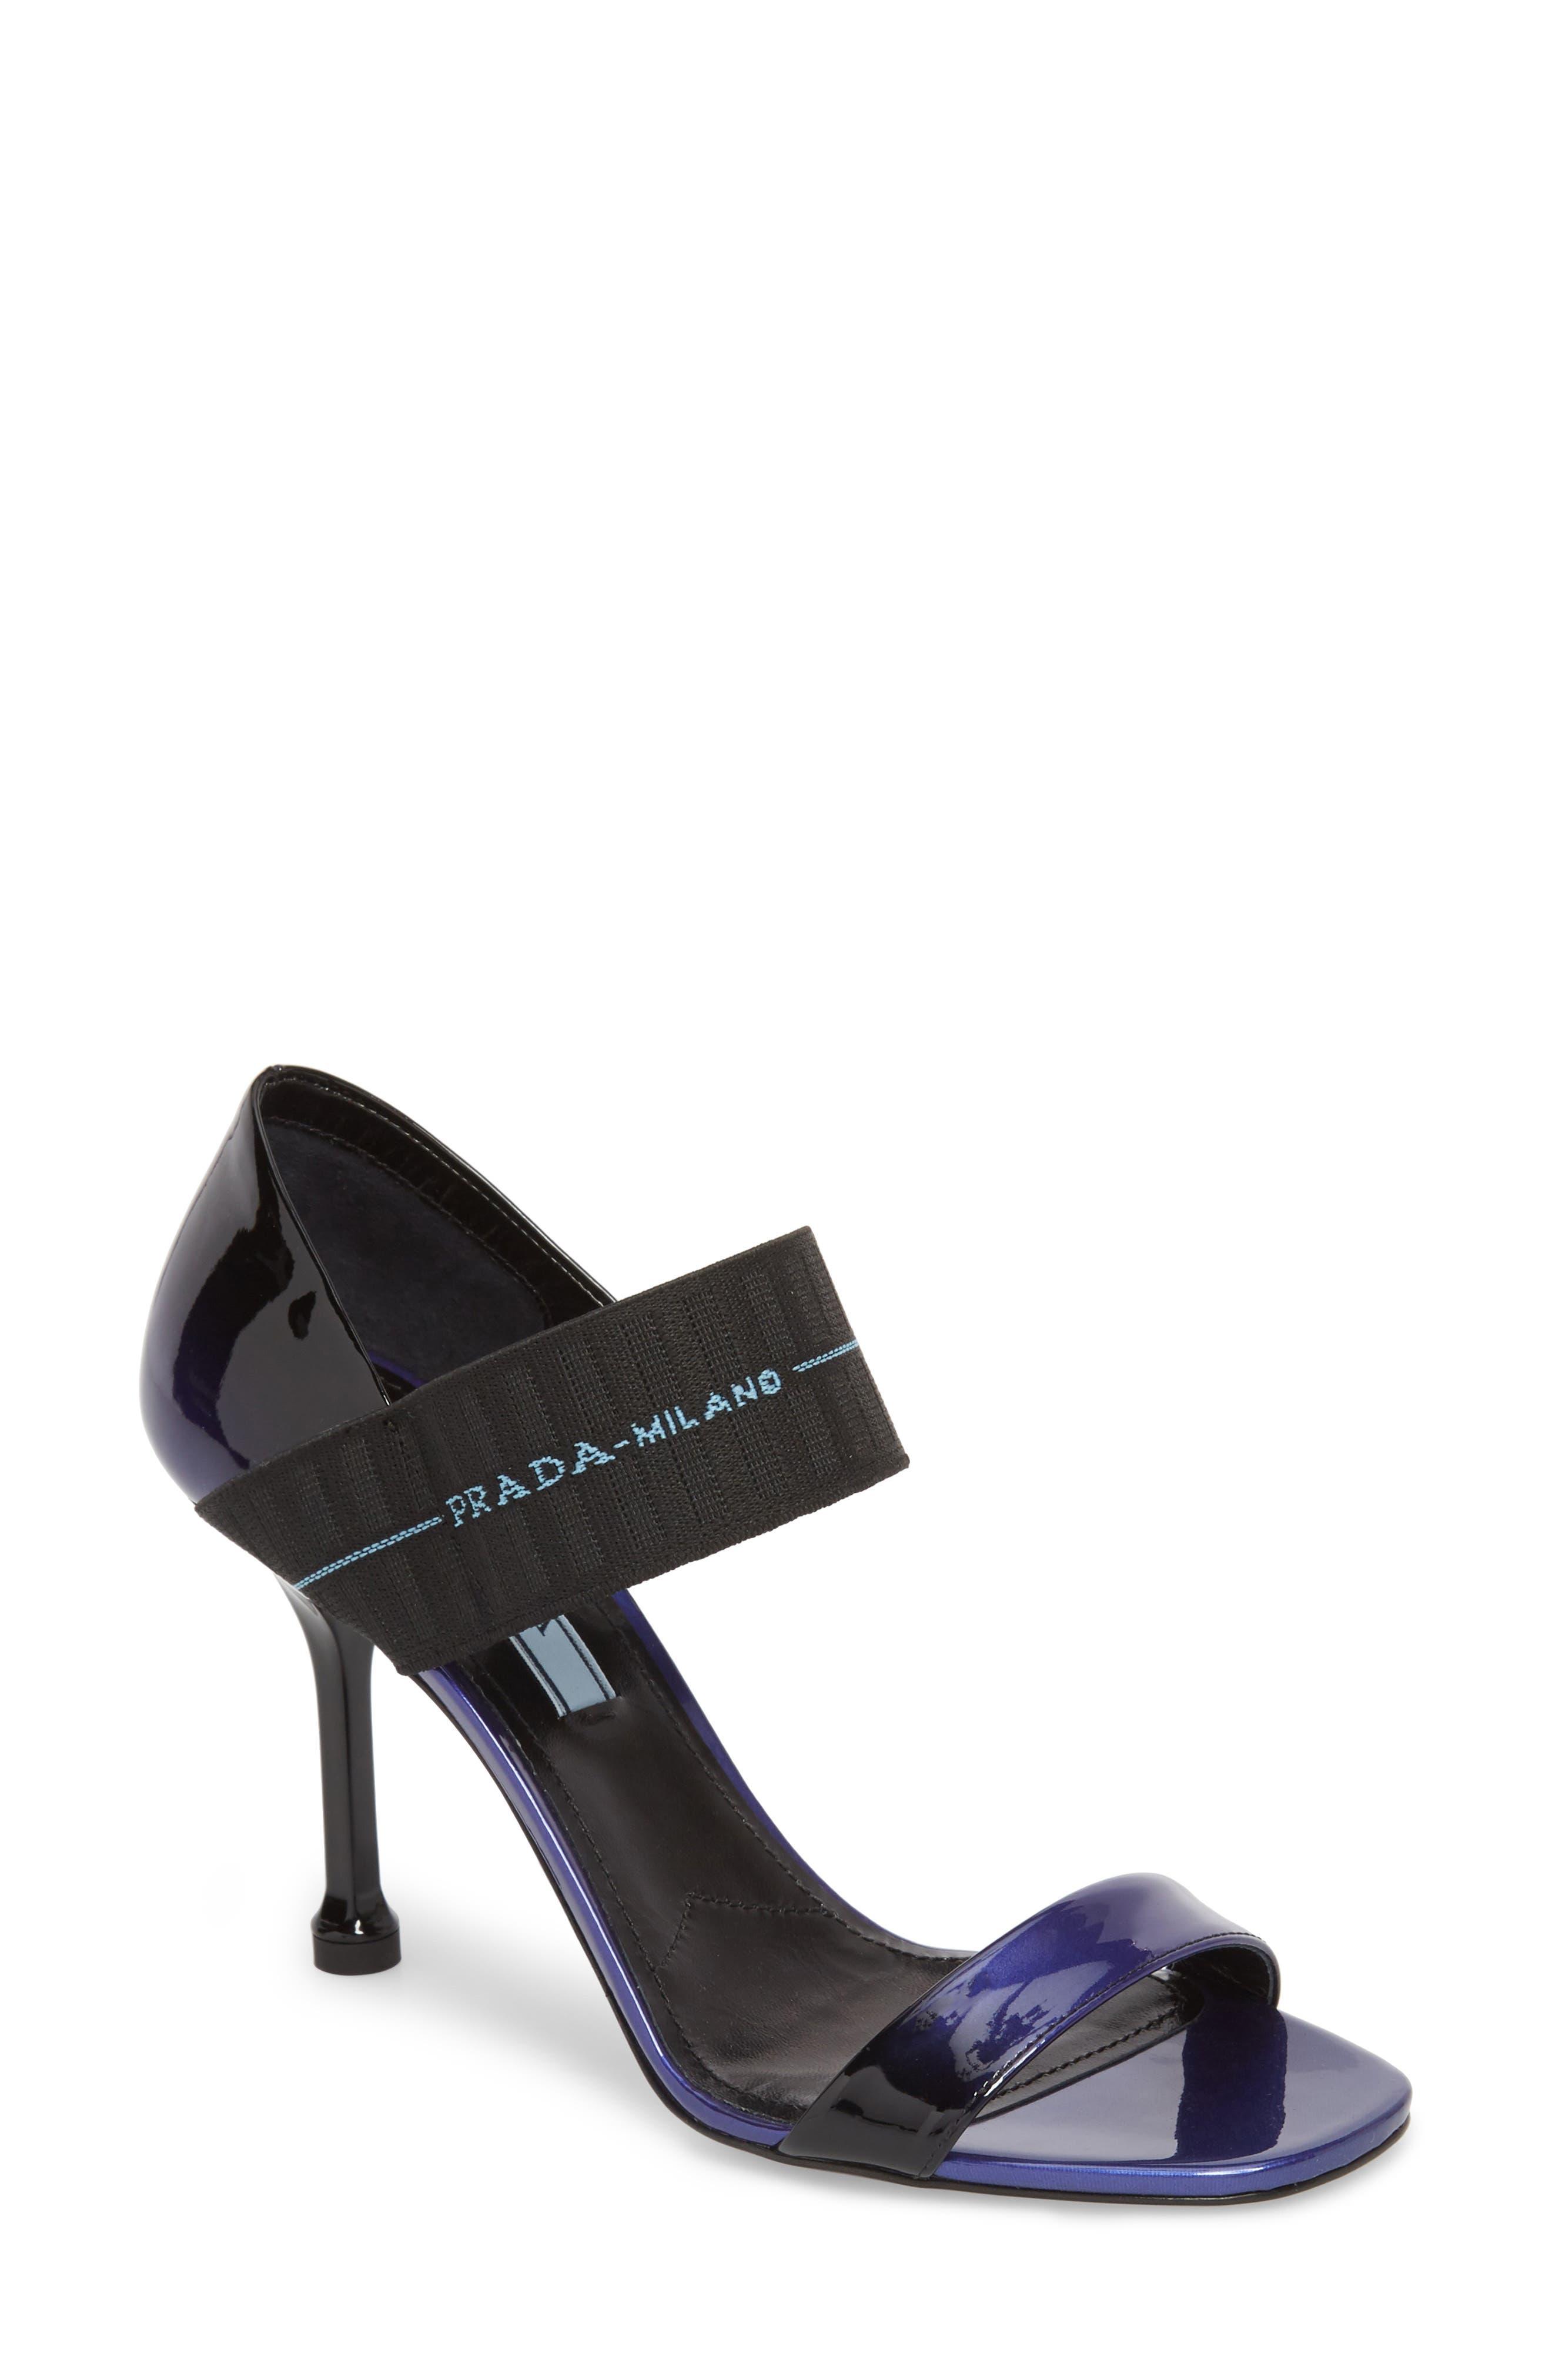 Ombré Banded Sandal by Prada